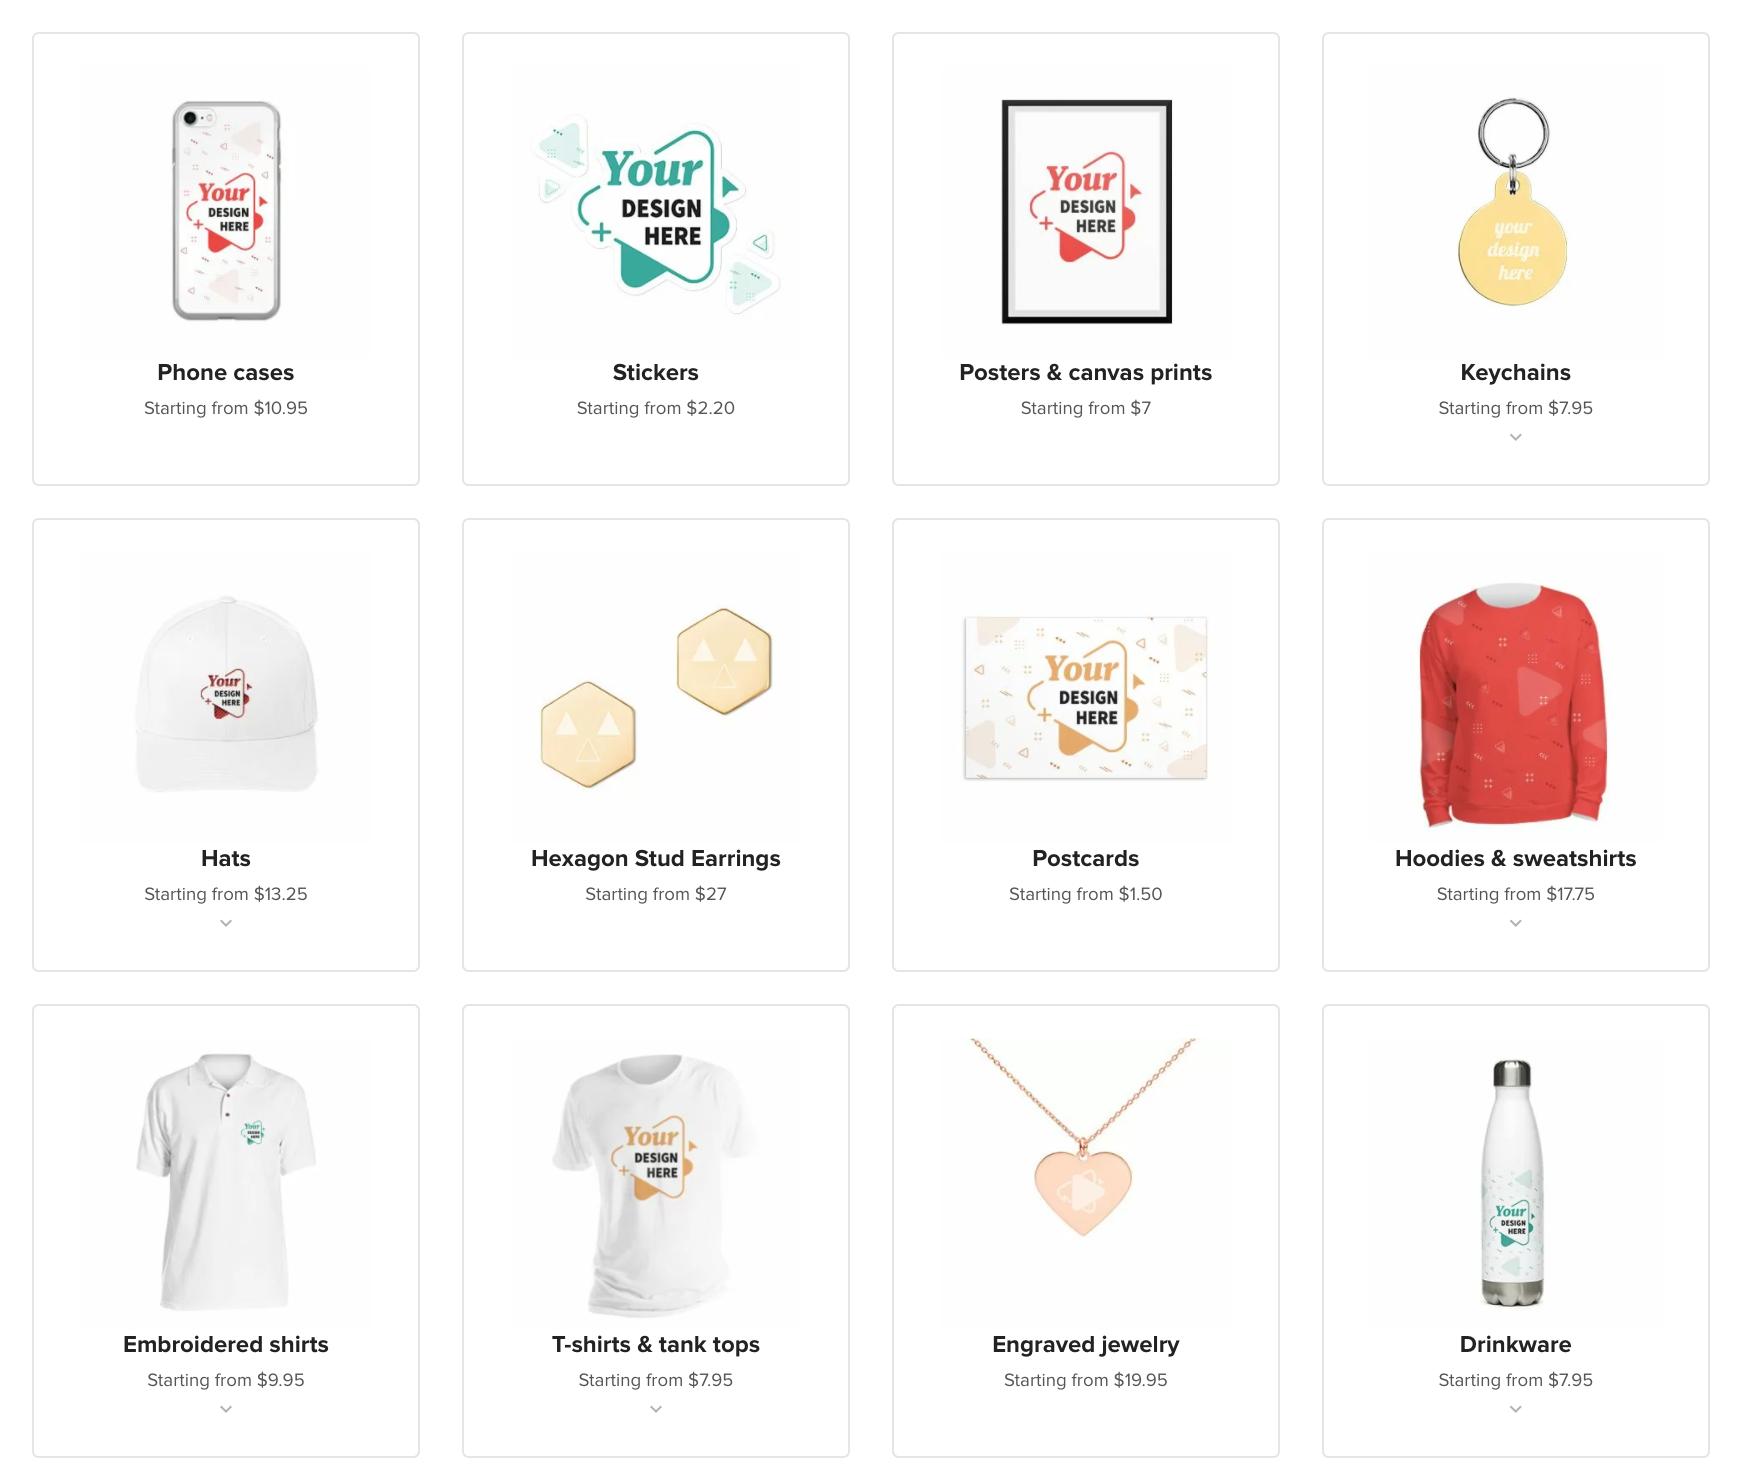 Best Print-on-Demand Websites: Printful